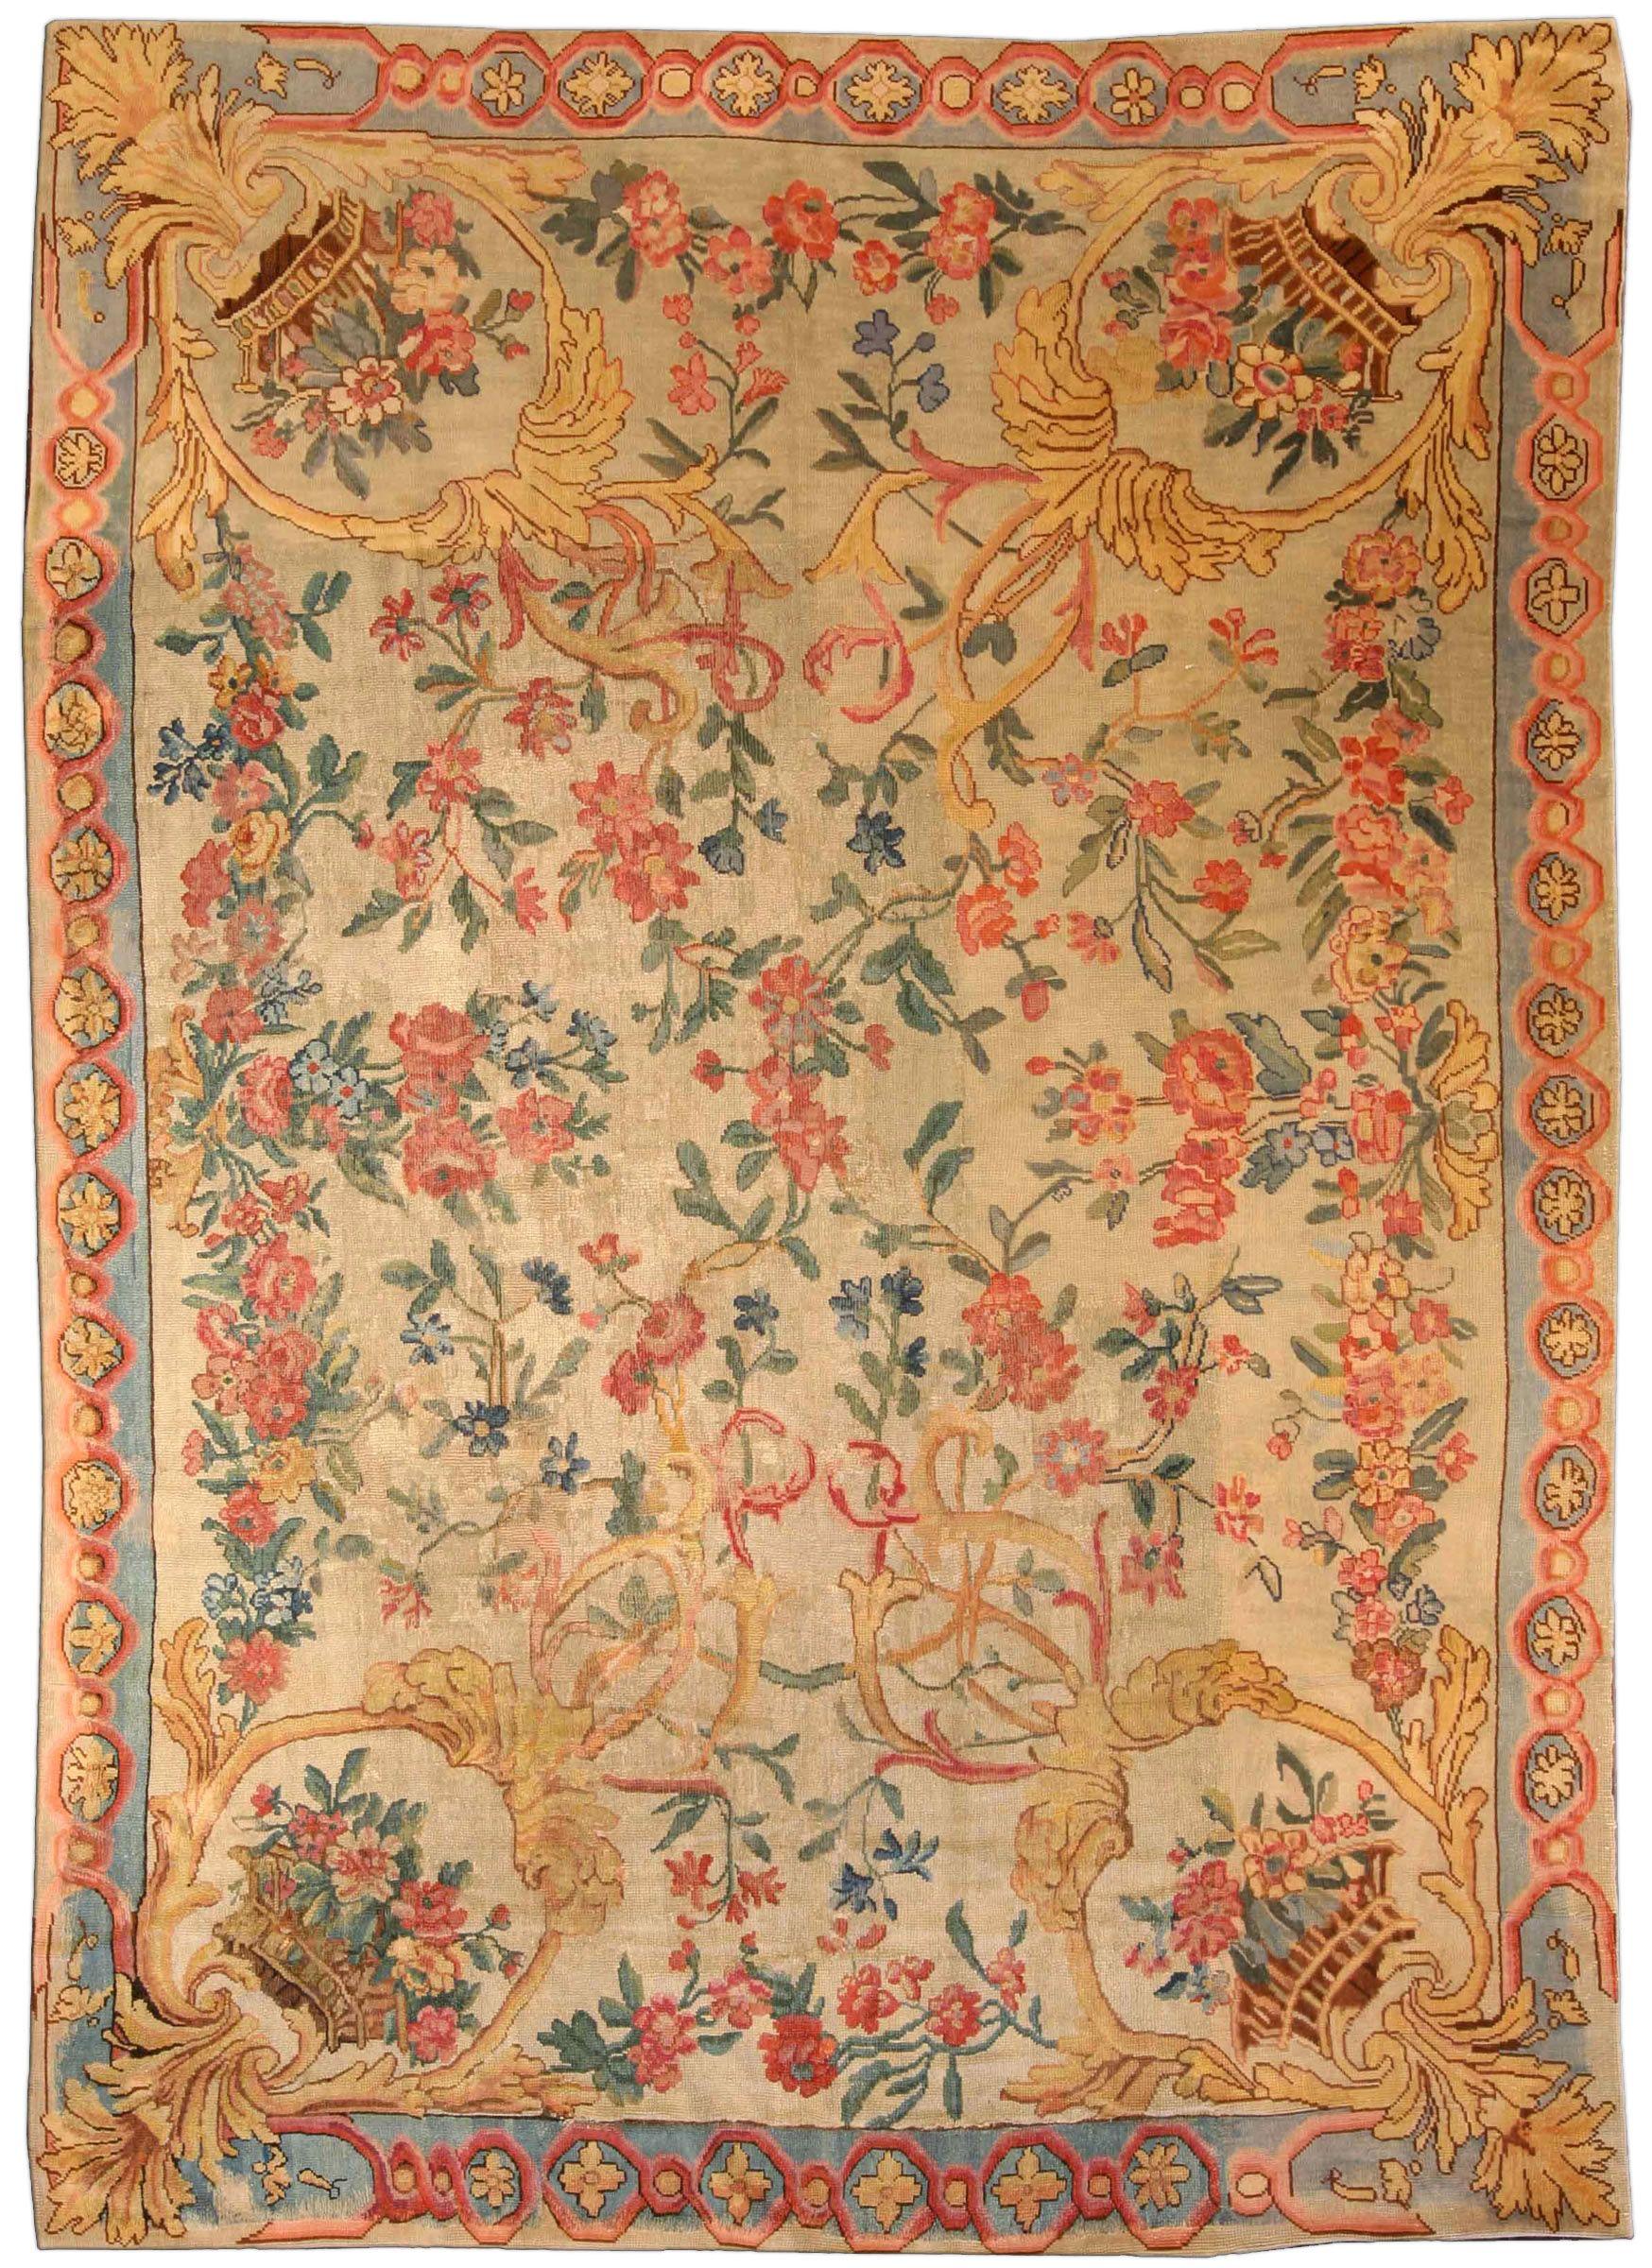 European Rugs From New York Gallery Doris Leslie Blau Antique Rugs 19th Century Rugs On Carpet Rugs